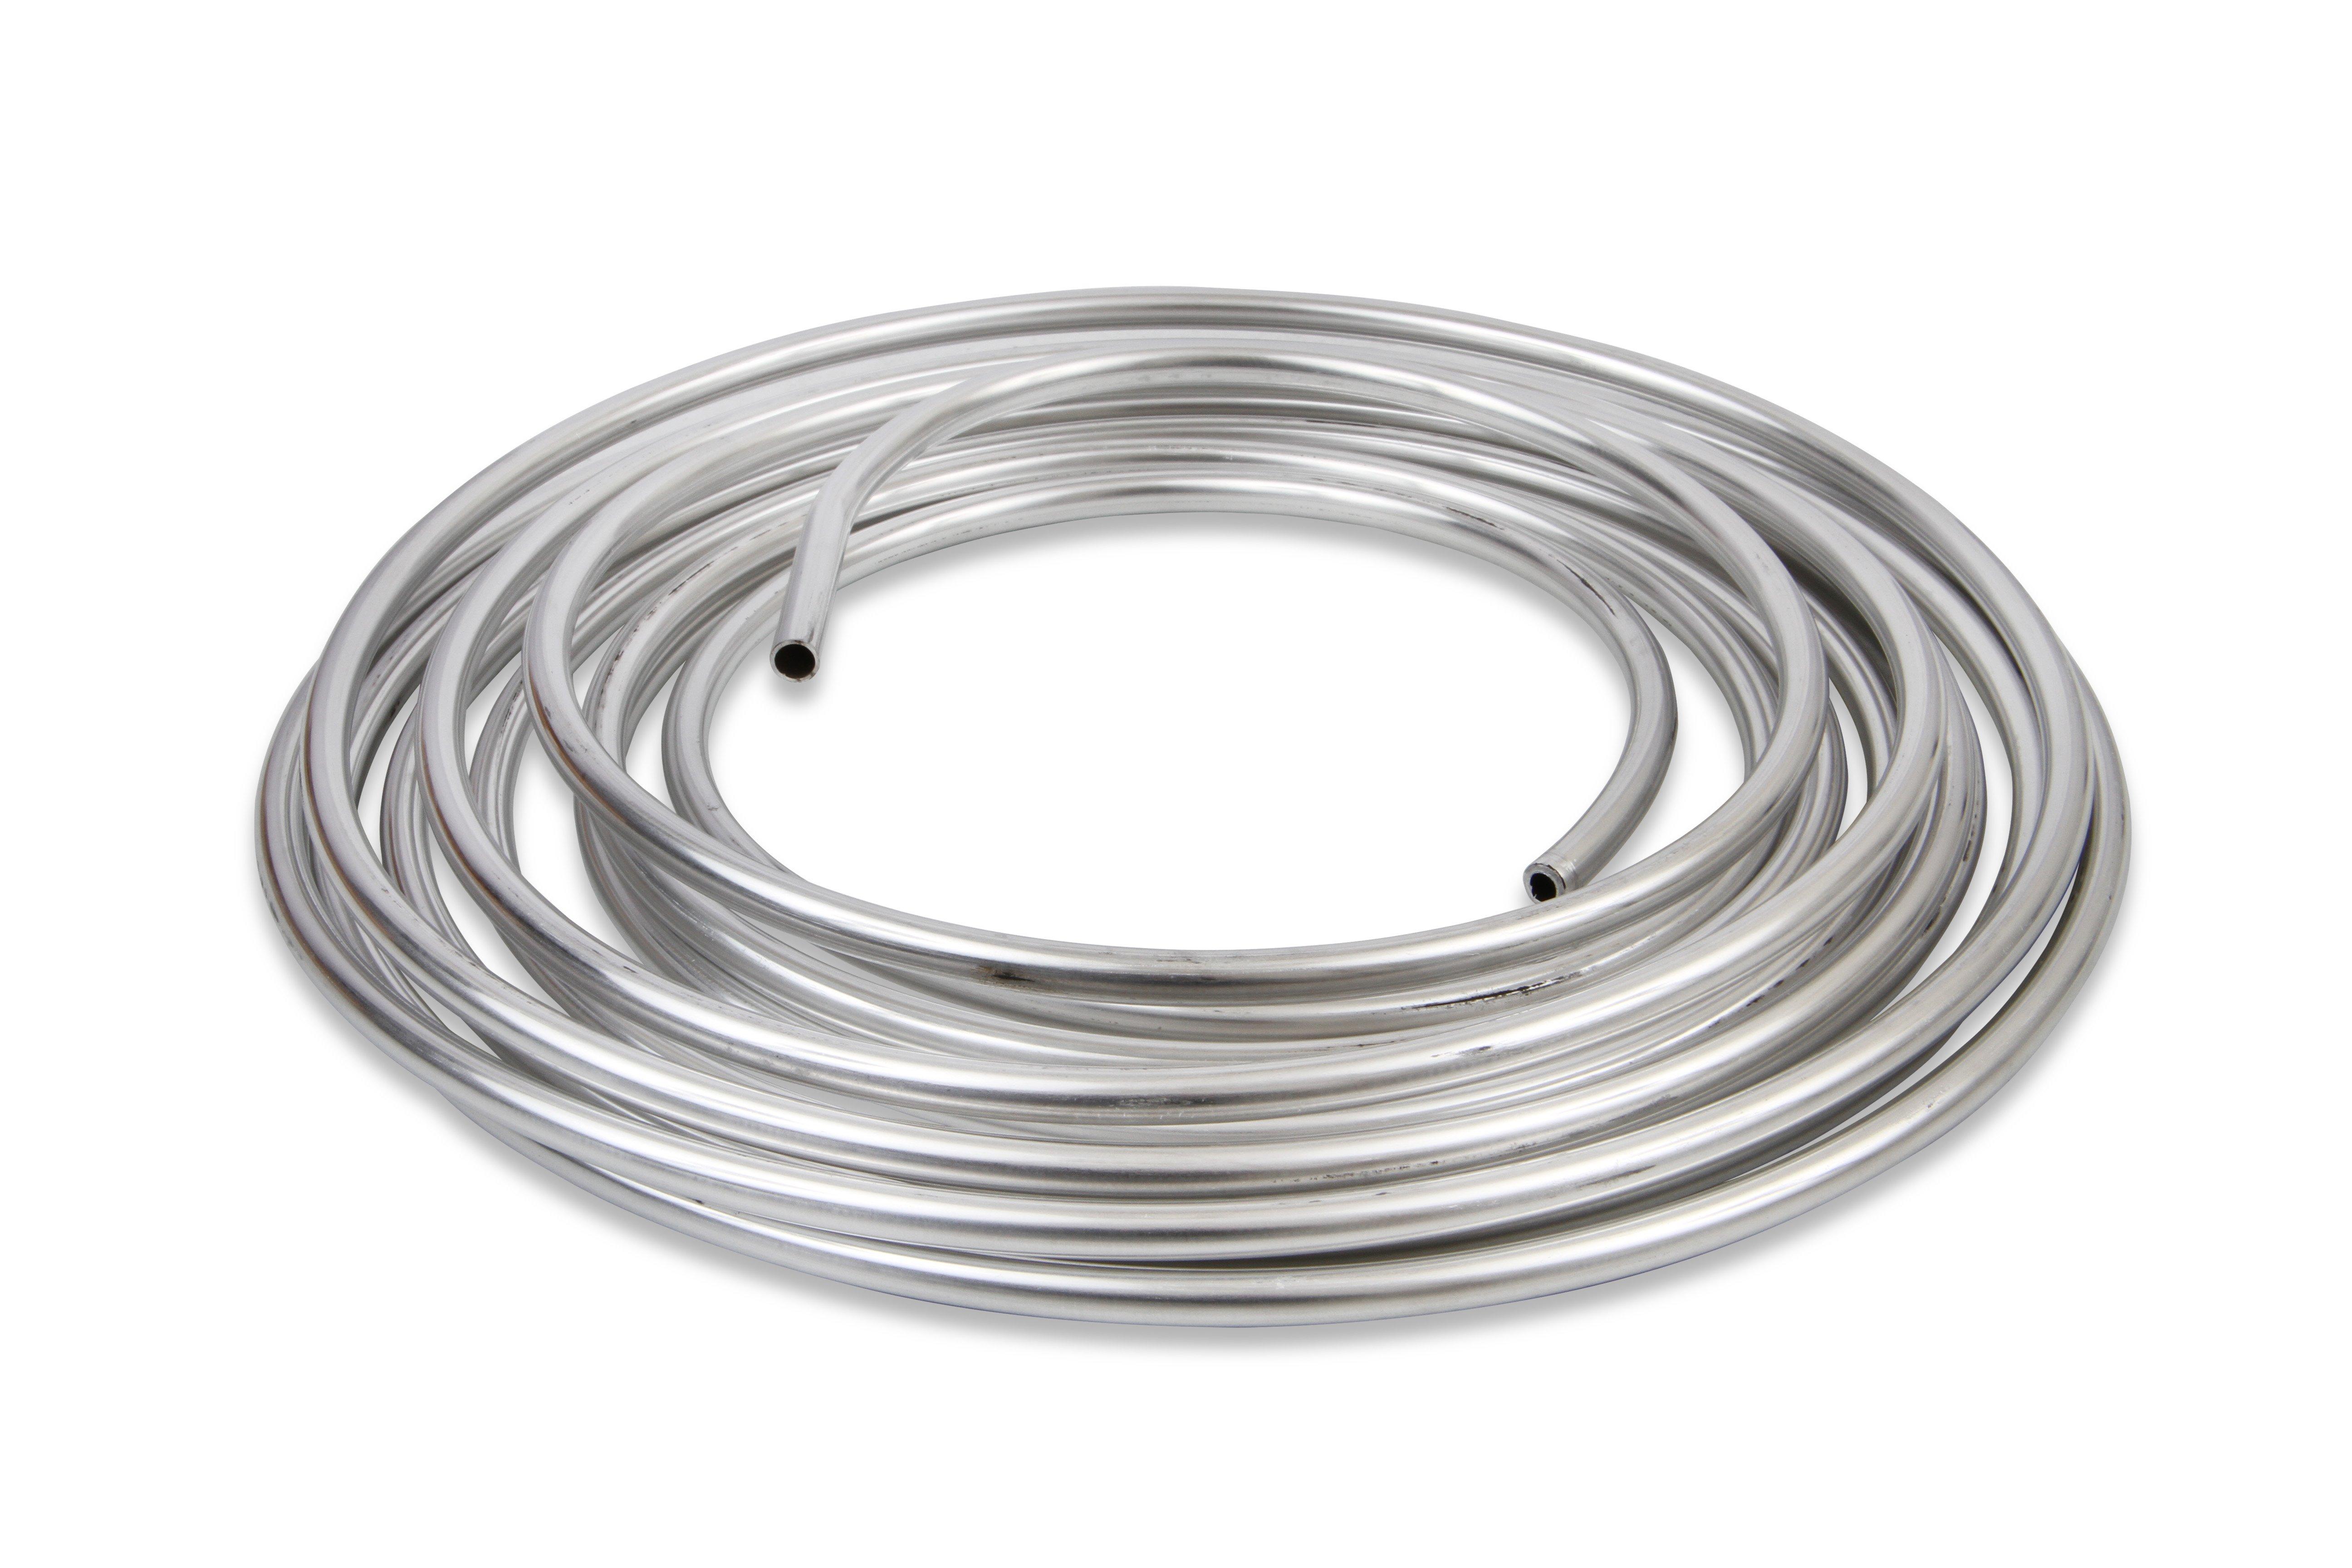 Earls 100037ERL Earls Annealed Aluminum Tubing